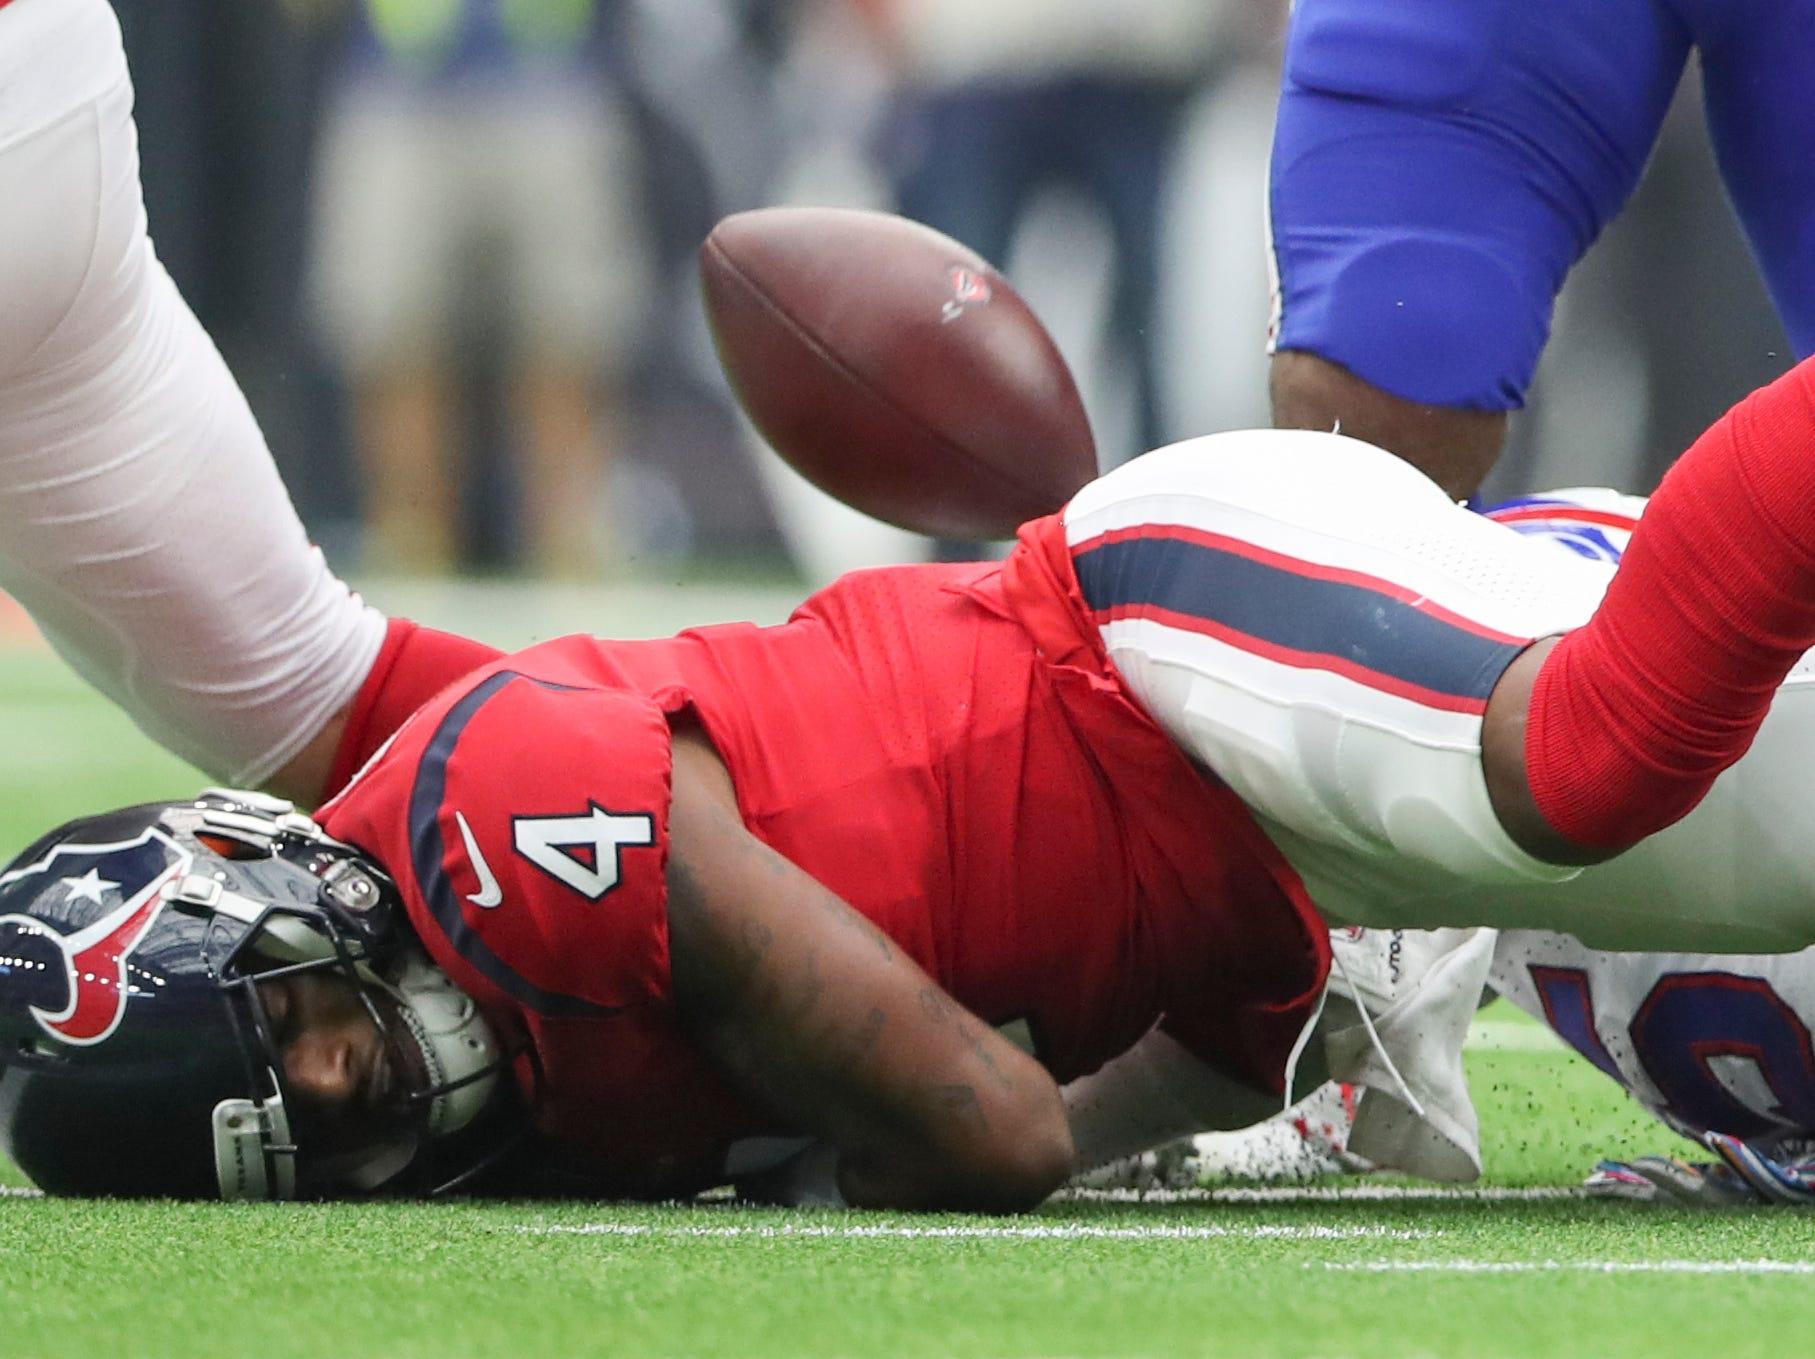 Oct 14, 2018; Houston, TX, USA; Houston Texans quarterback Deshaun Watson (4) fumbles during the second half against the Buffalo Bills at NRG Stadium. Mandatory Credit: Kevin Jairaj-USA TODAY Sports